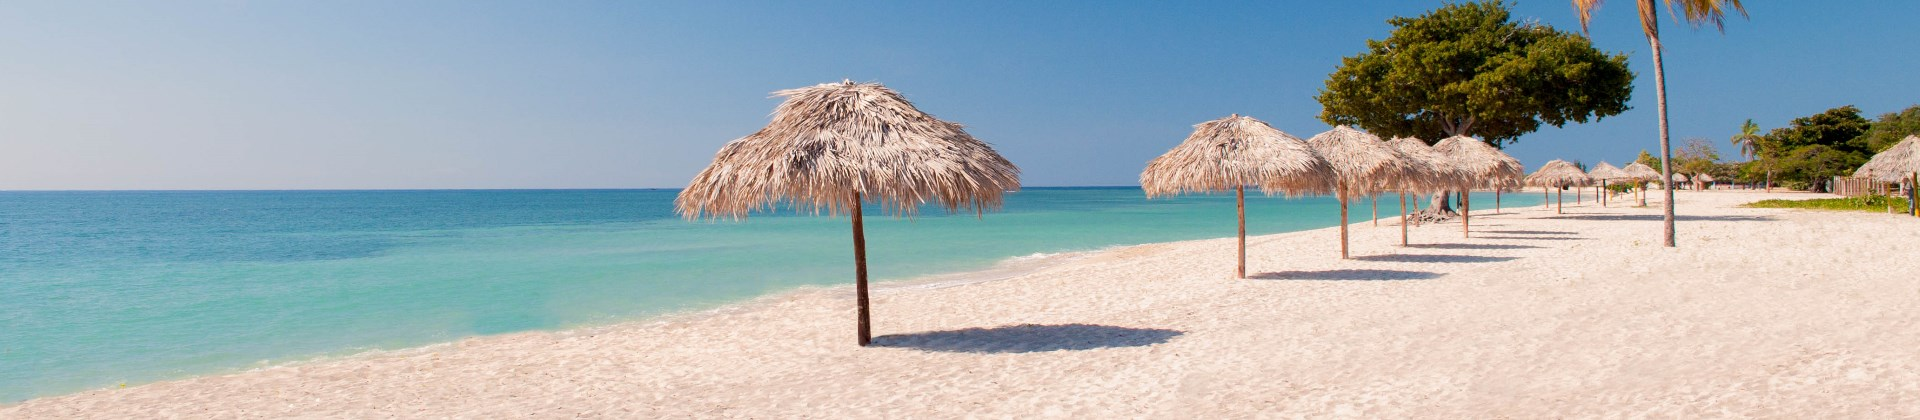 Beste reistijd Punta Cana